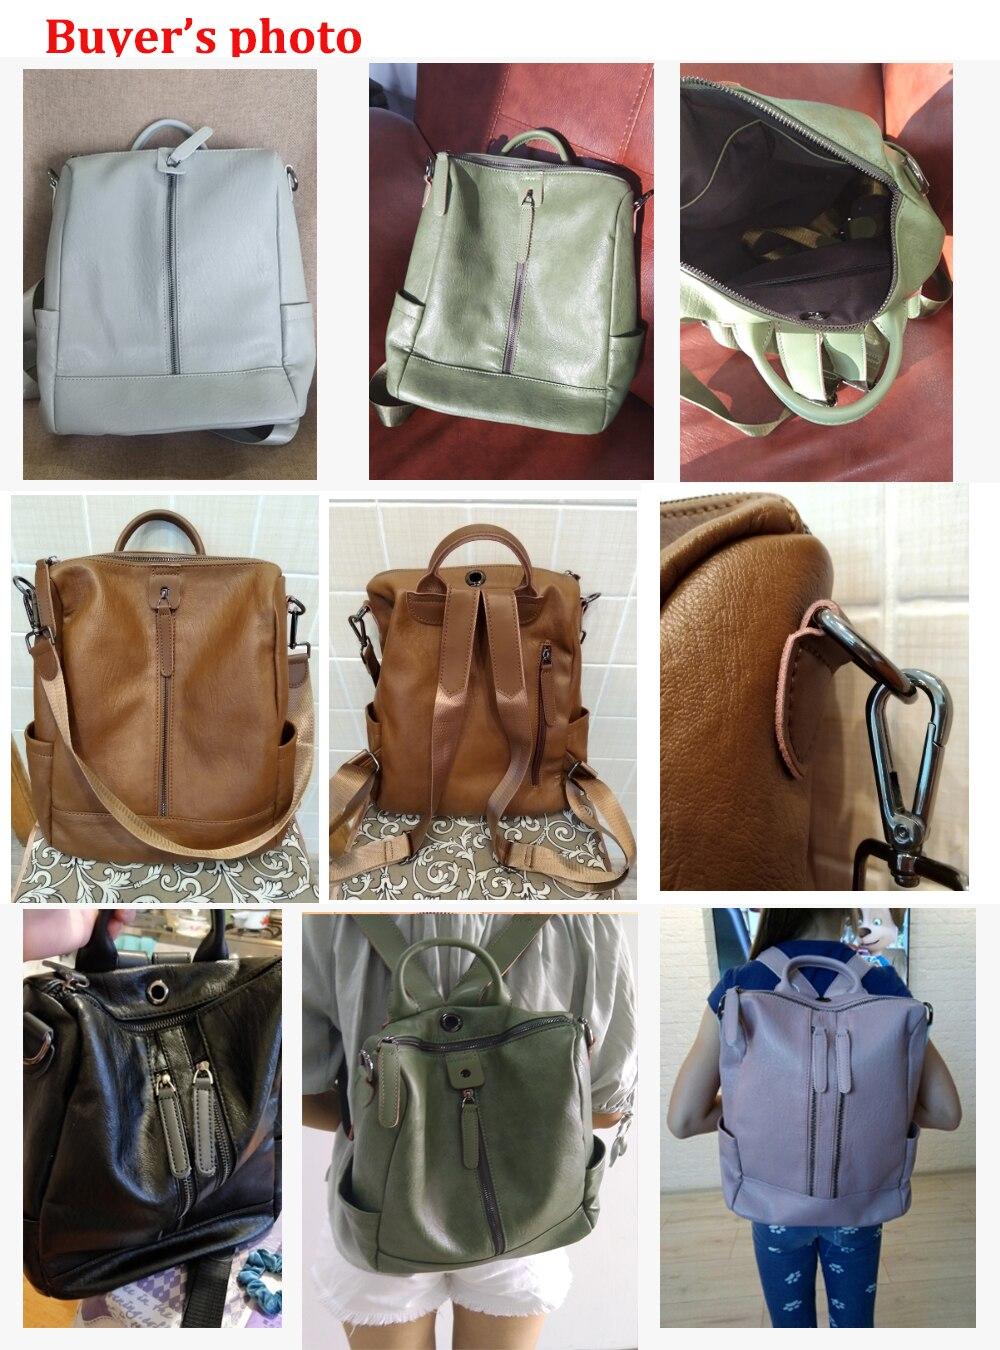 H26478165292f4f938bc8b79cc3d9bd55D Female backpack mochila feminina casual Multifunction Women Leather Backpack Female Shoulder Bag Sac A Dos Travel Back Pack